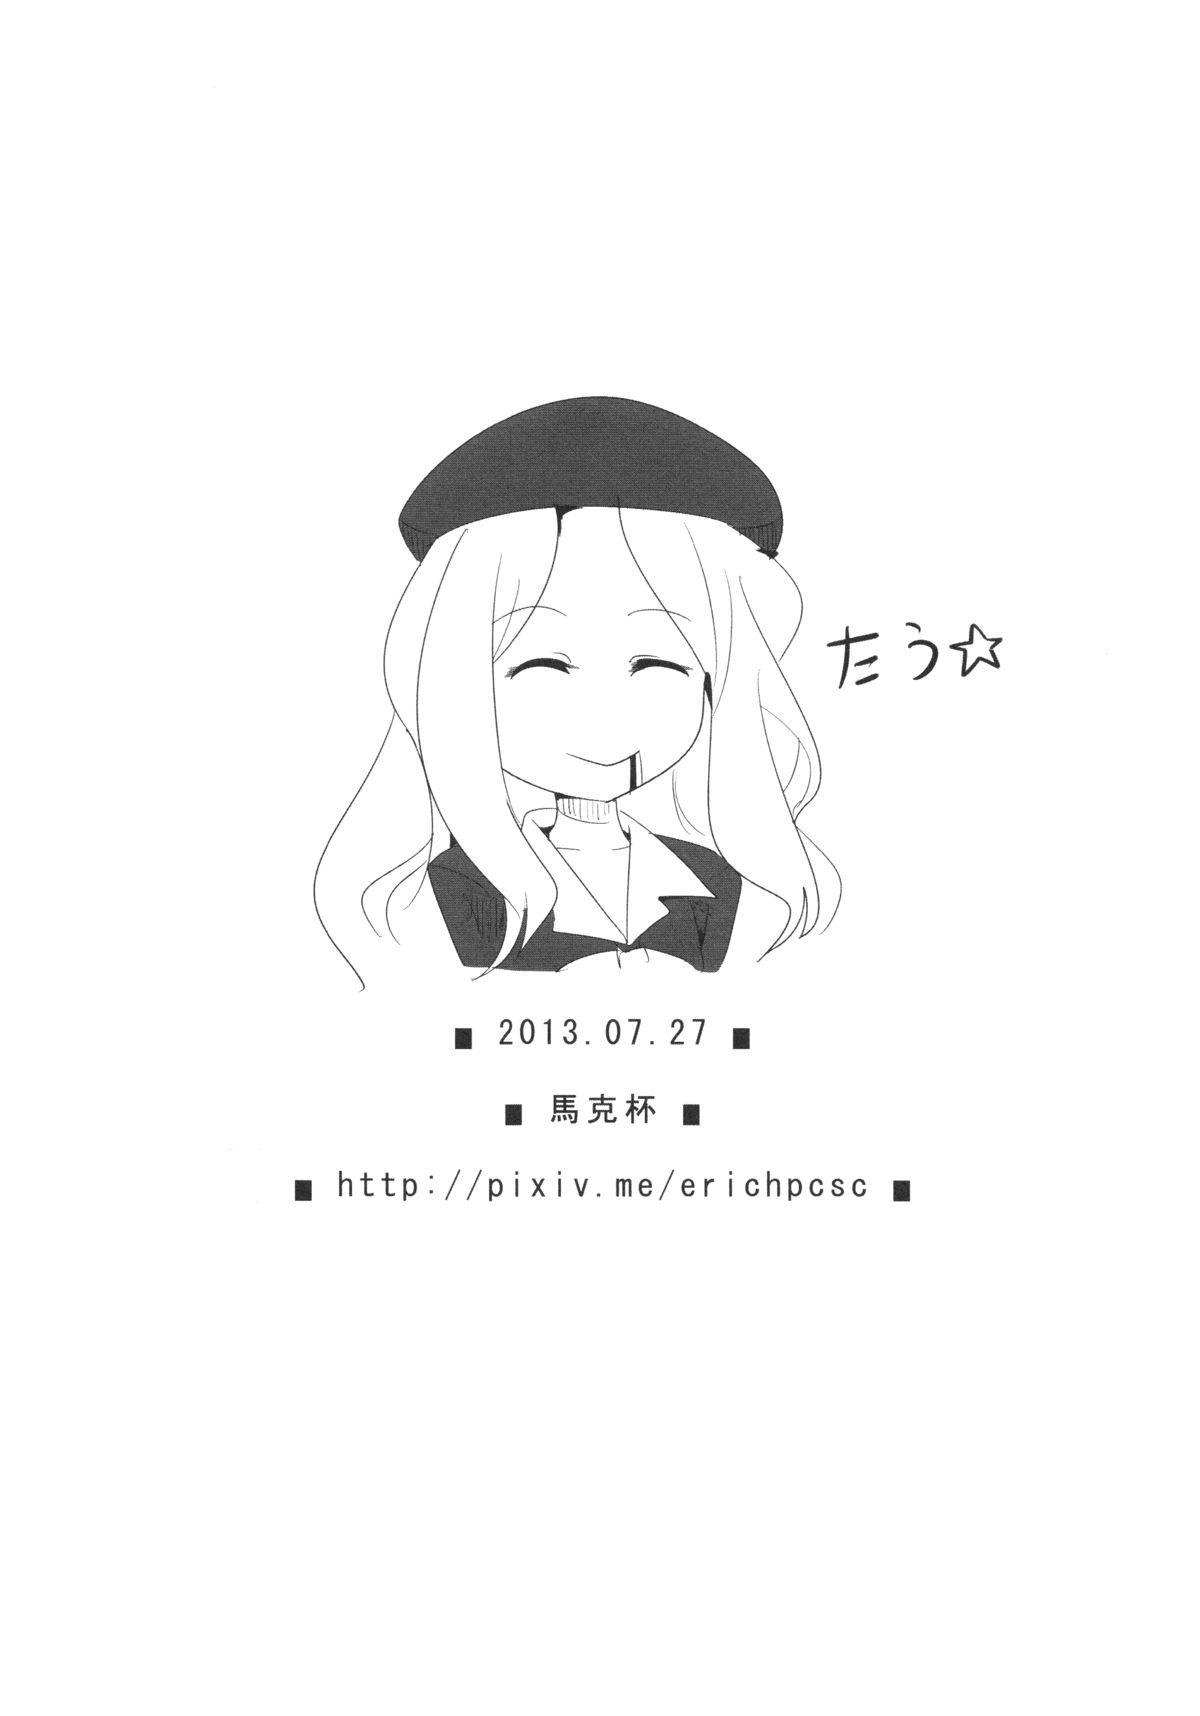 (FF22) [Magukappu (Magukappu)] Frenda-chan no Biribiri Choukyou Hou   Frenda-chan's Electric Training (Toaru Kagaku no Railgun) [English] [GreyAngel] 25